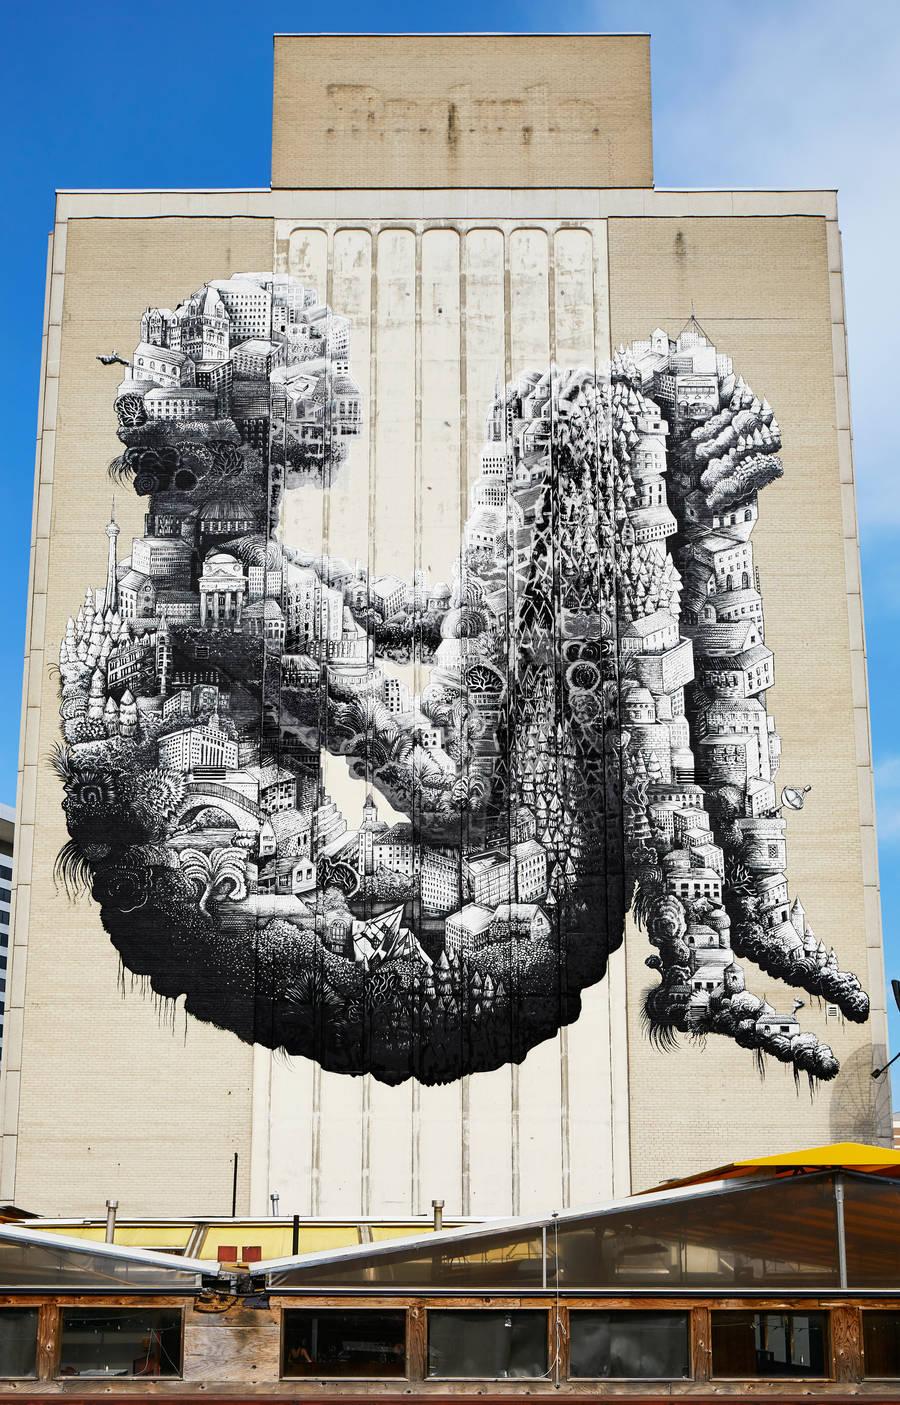 Gigantic Street Artwork in Toronto